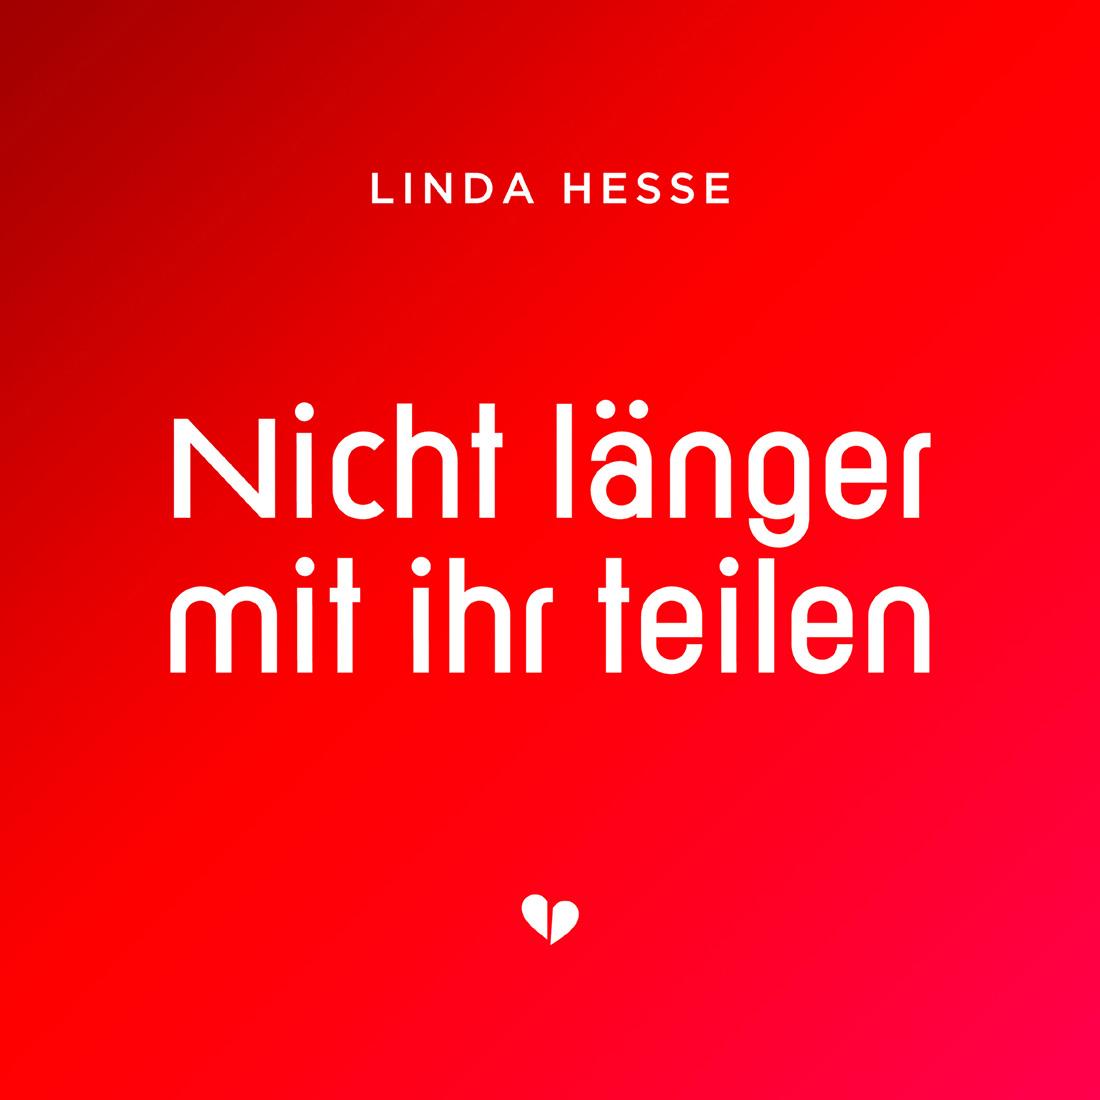 Linda Hesse – CD Cover